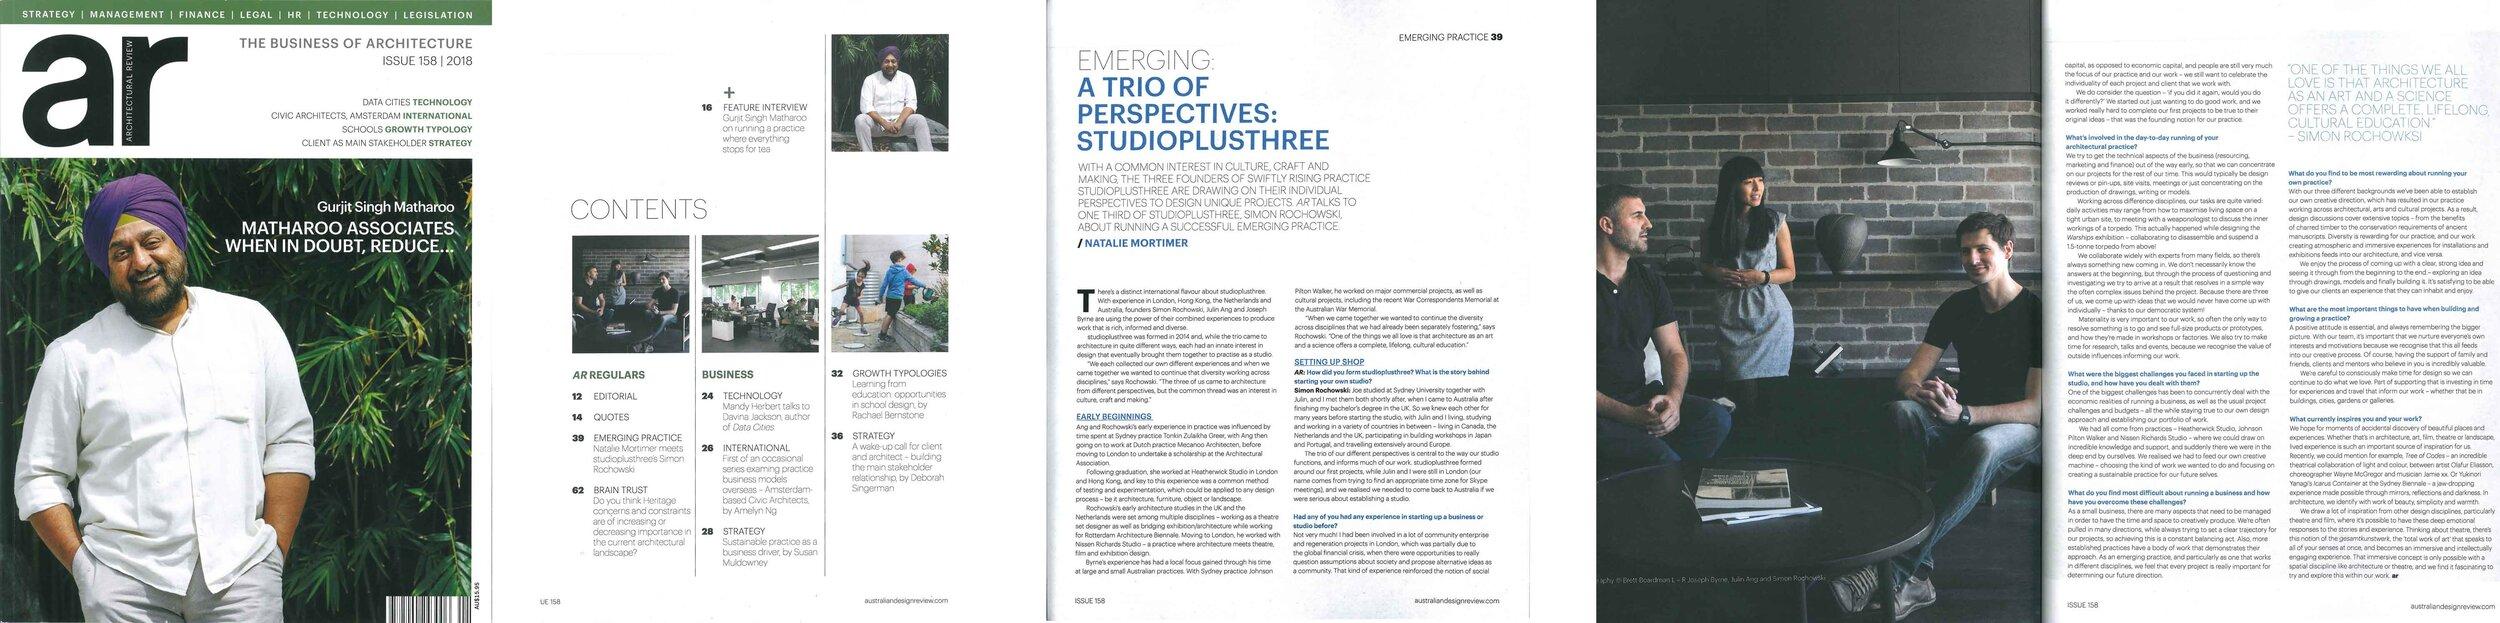 emerging practice studioplusthree architecture review.jpg